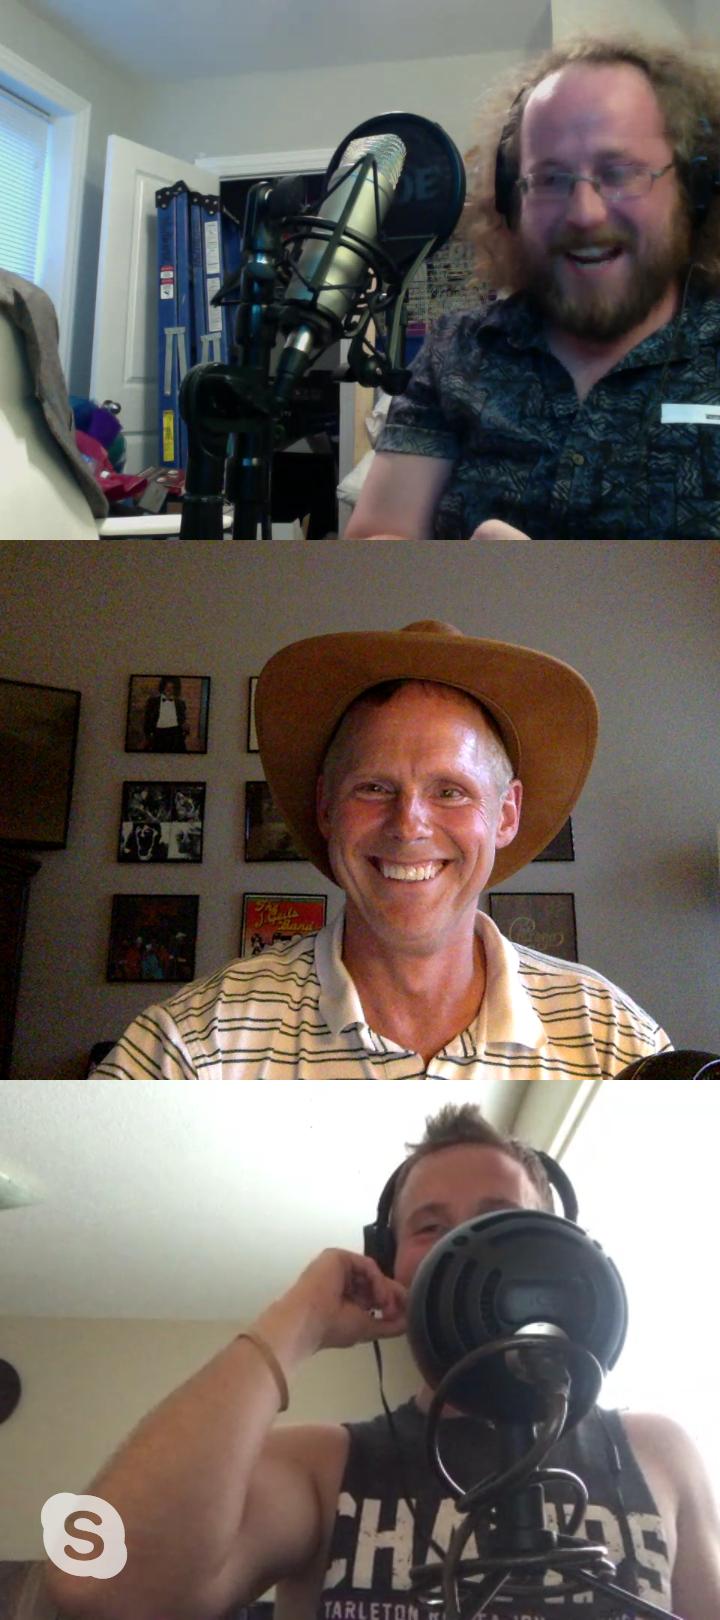 Pop's hat - without headphones